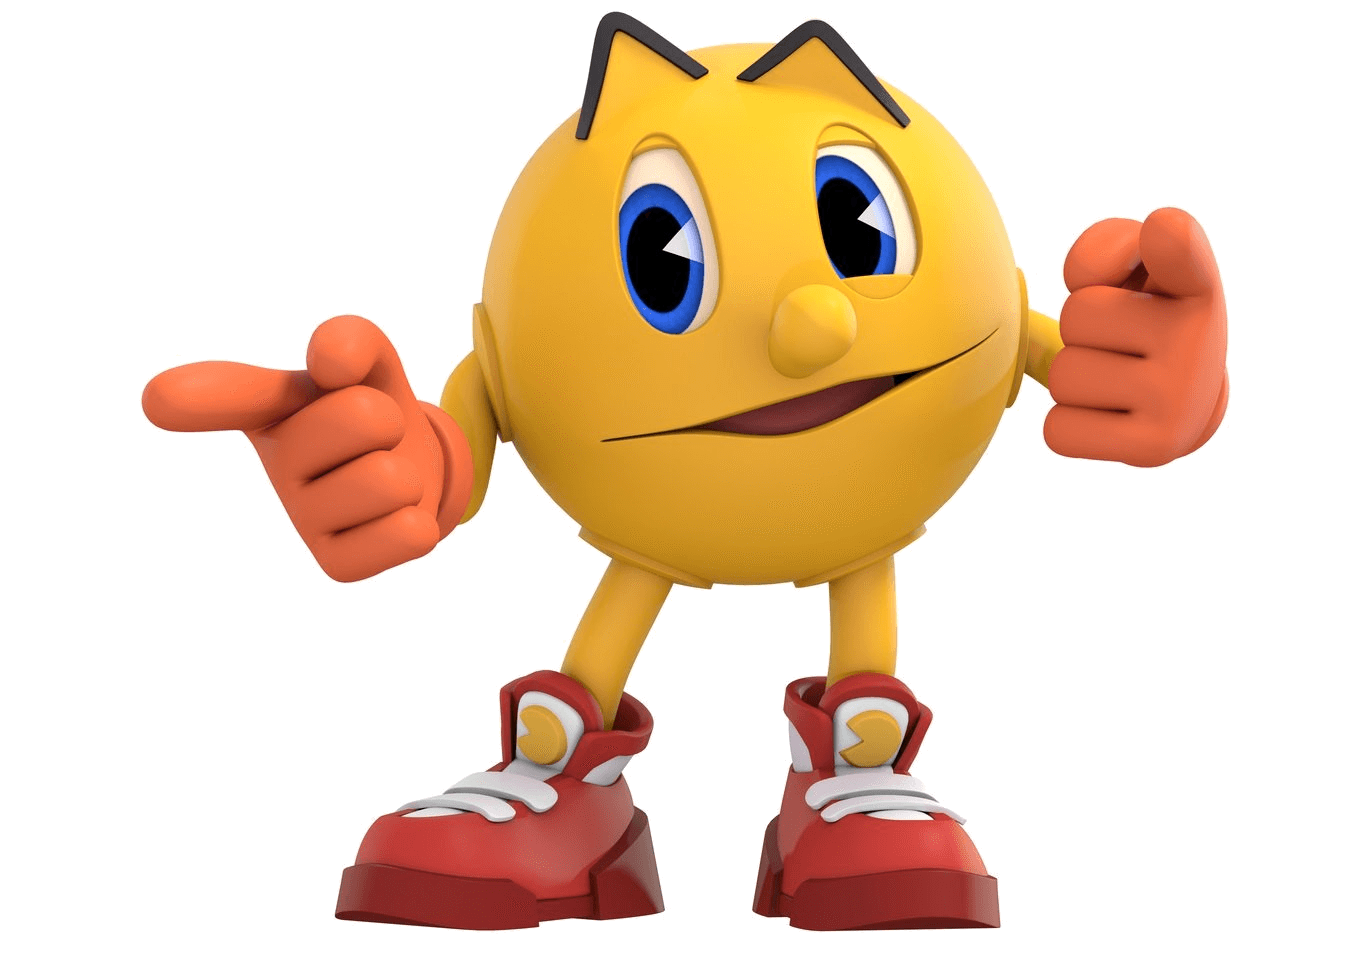 Pacman Pointing Finger Transparent Png Stickpng